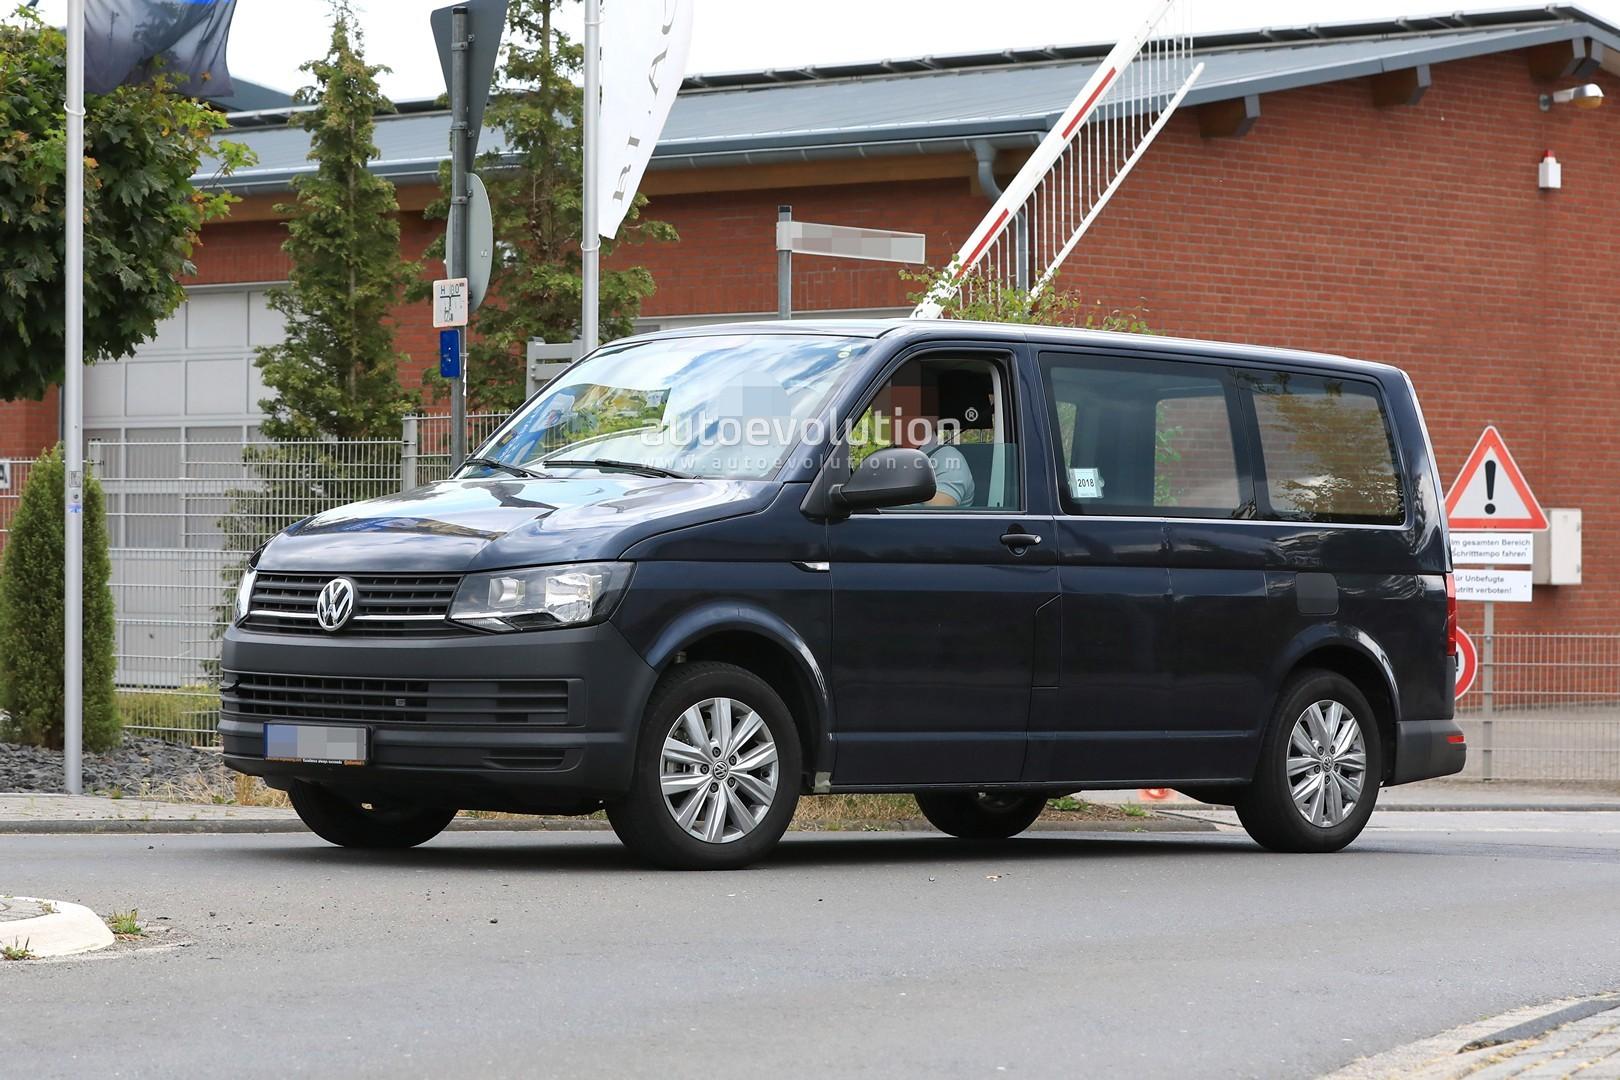 Spyshots: 2020 Volkswagen T7 Mule Might Be a Plug-in Hybrid - autoevolution